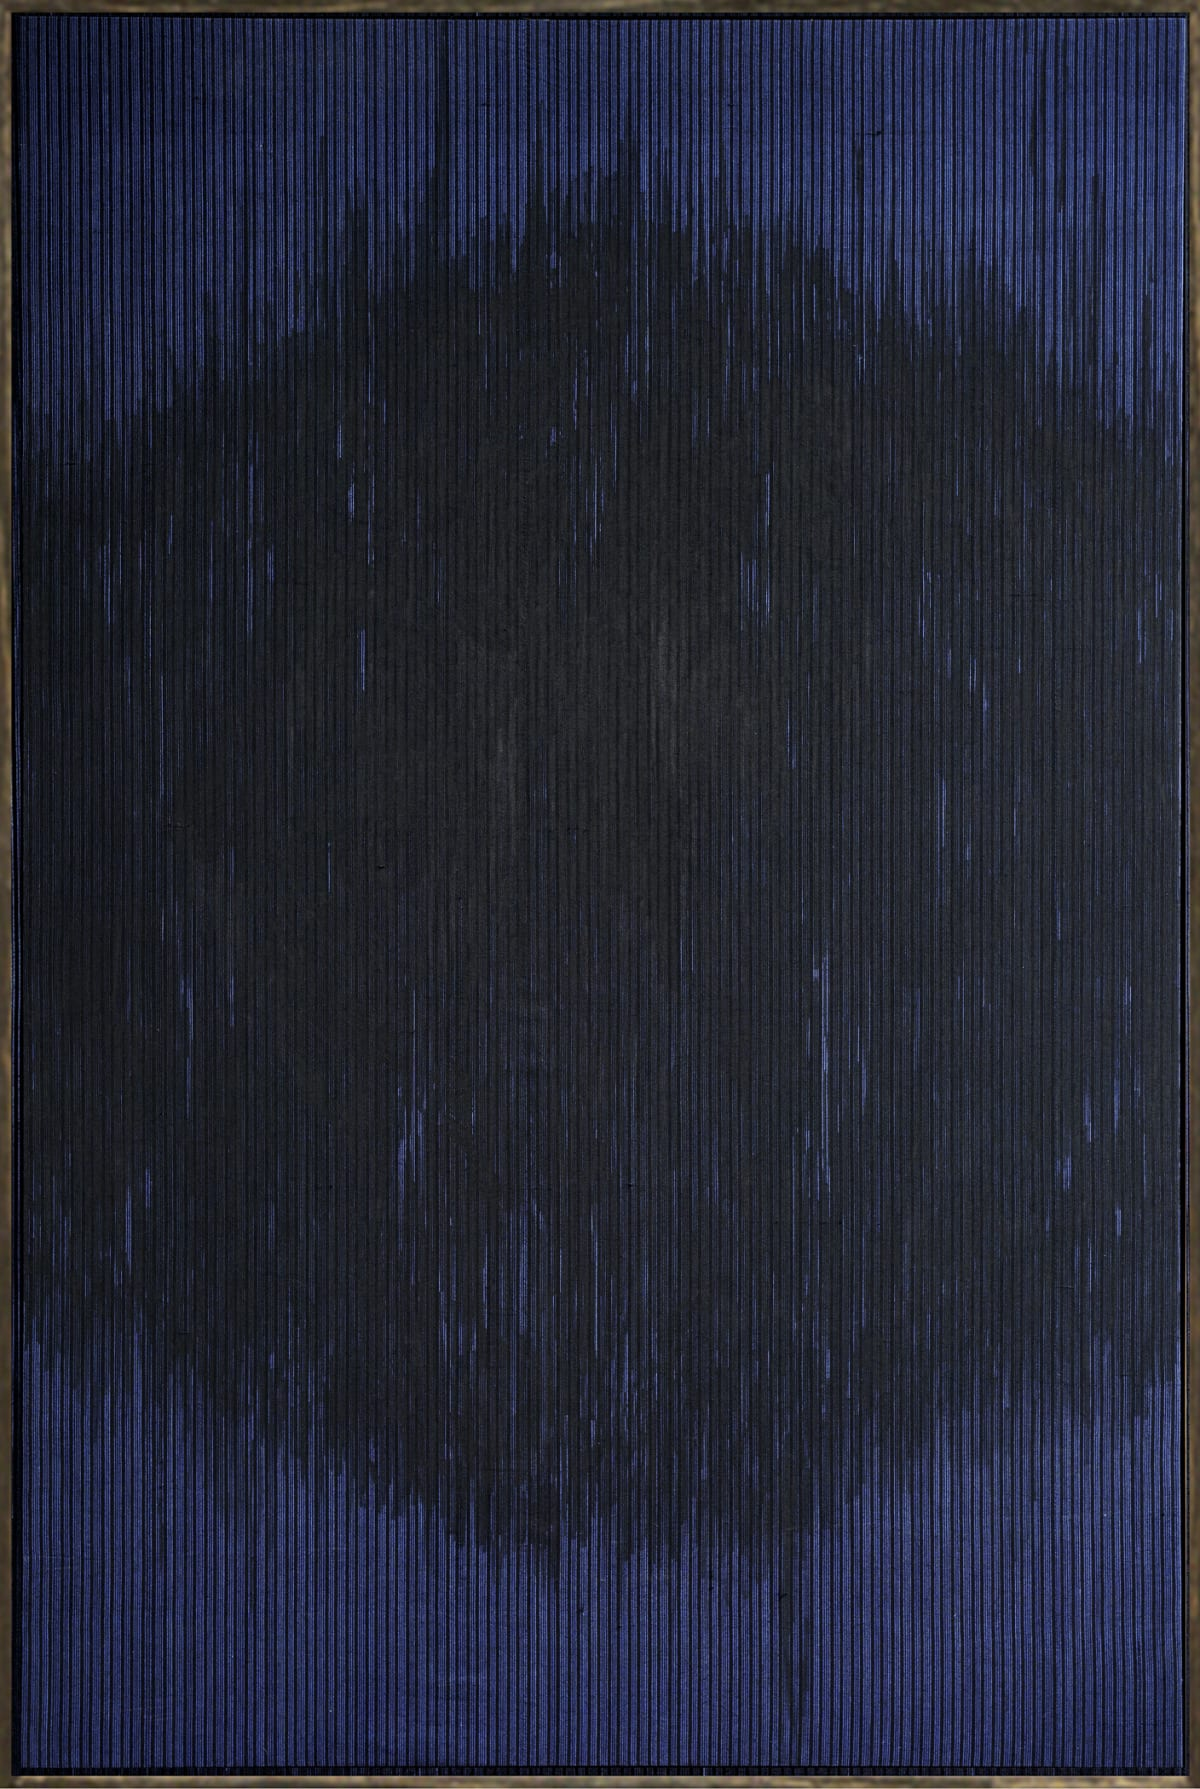 Kewulu Minangka Prepat II, 2021